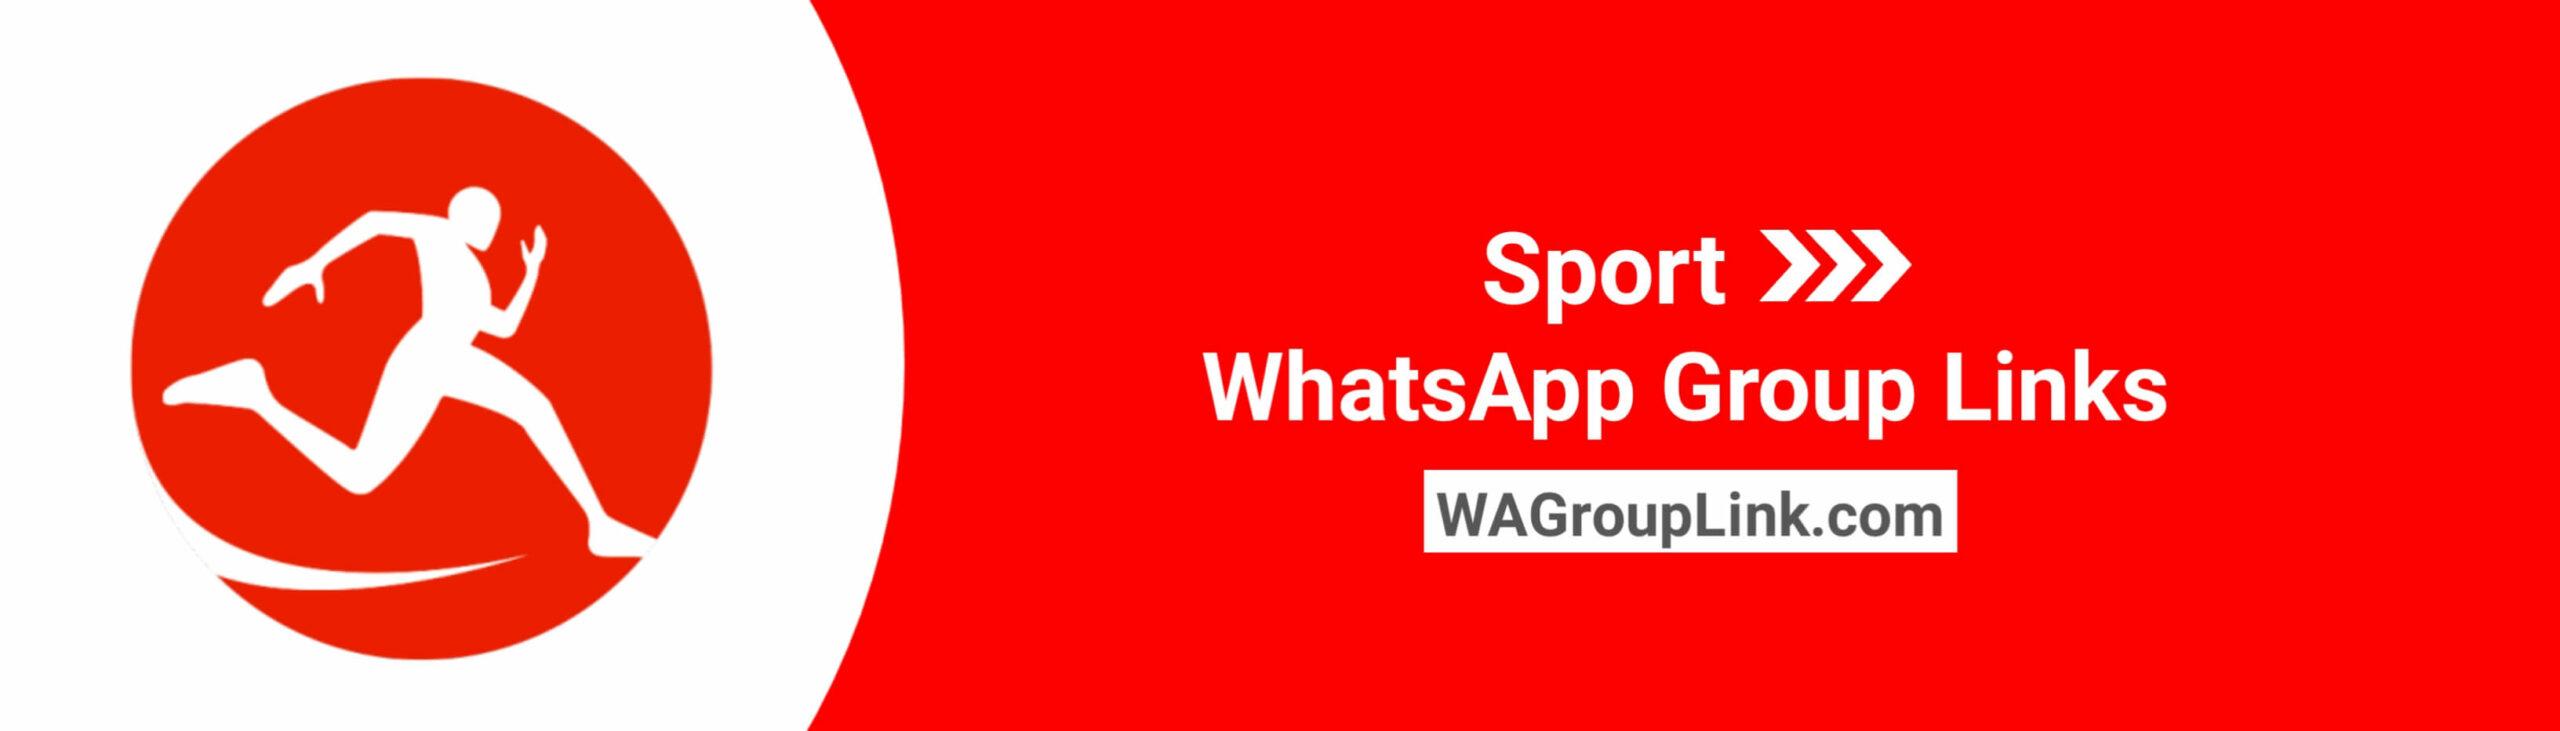 Sports WhatsApp Group Links